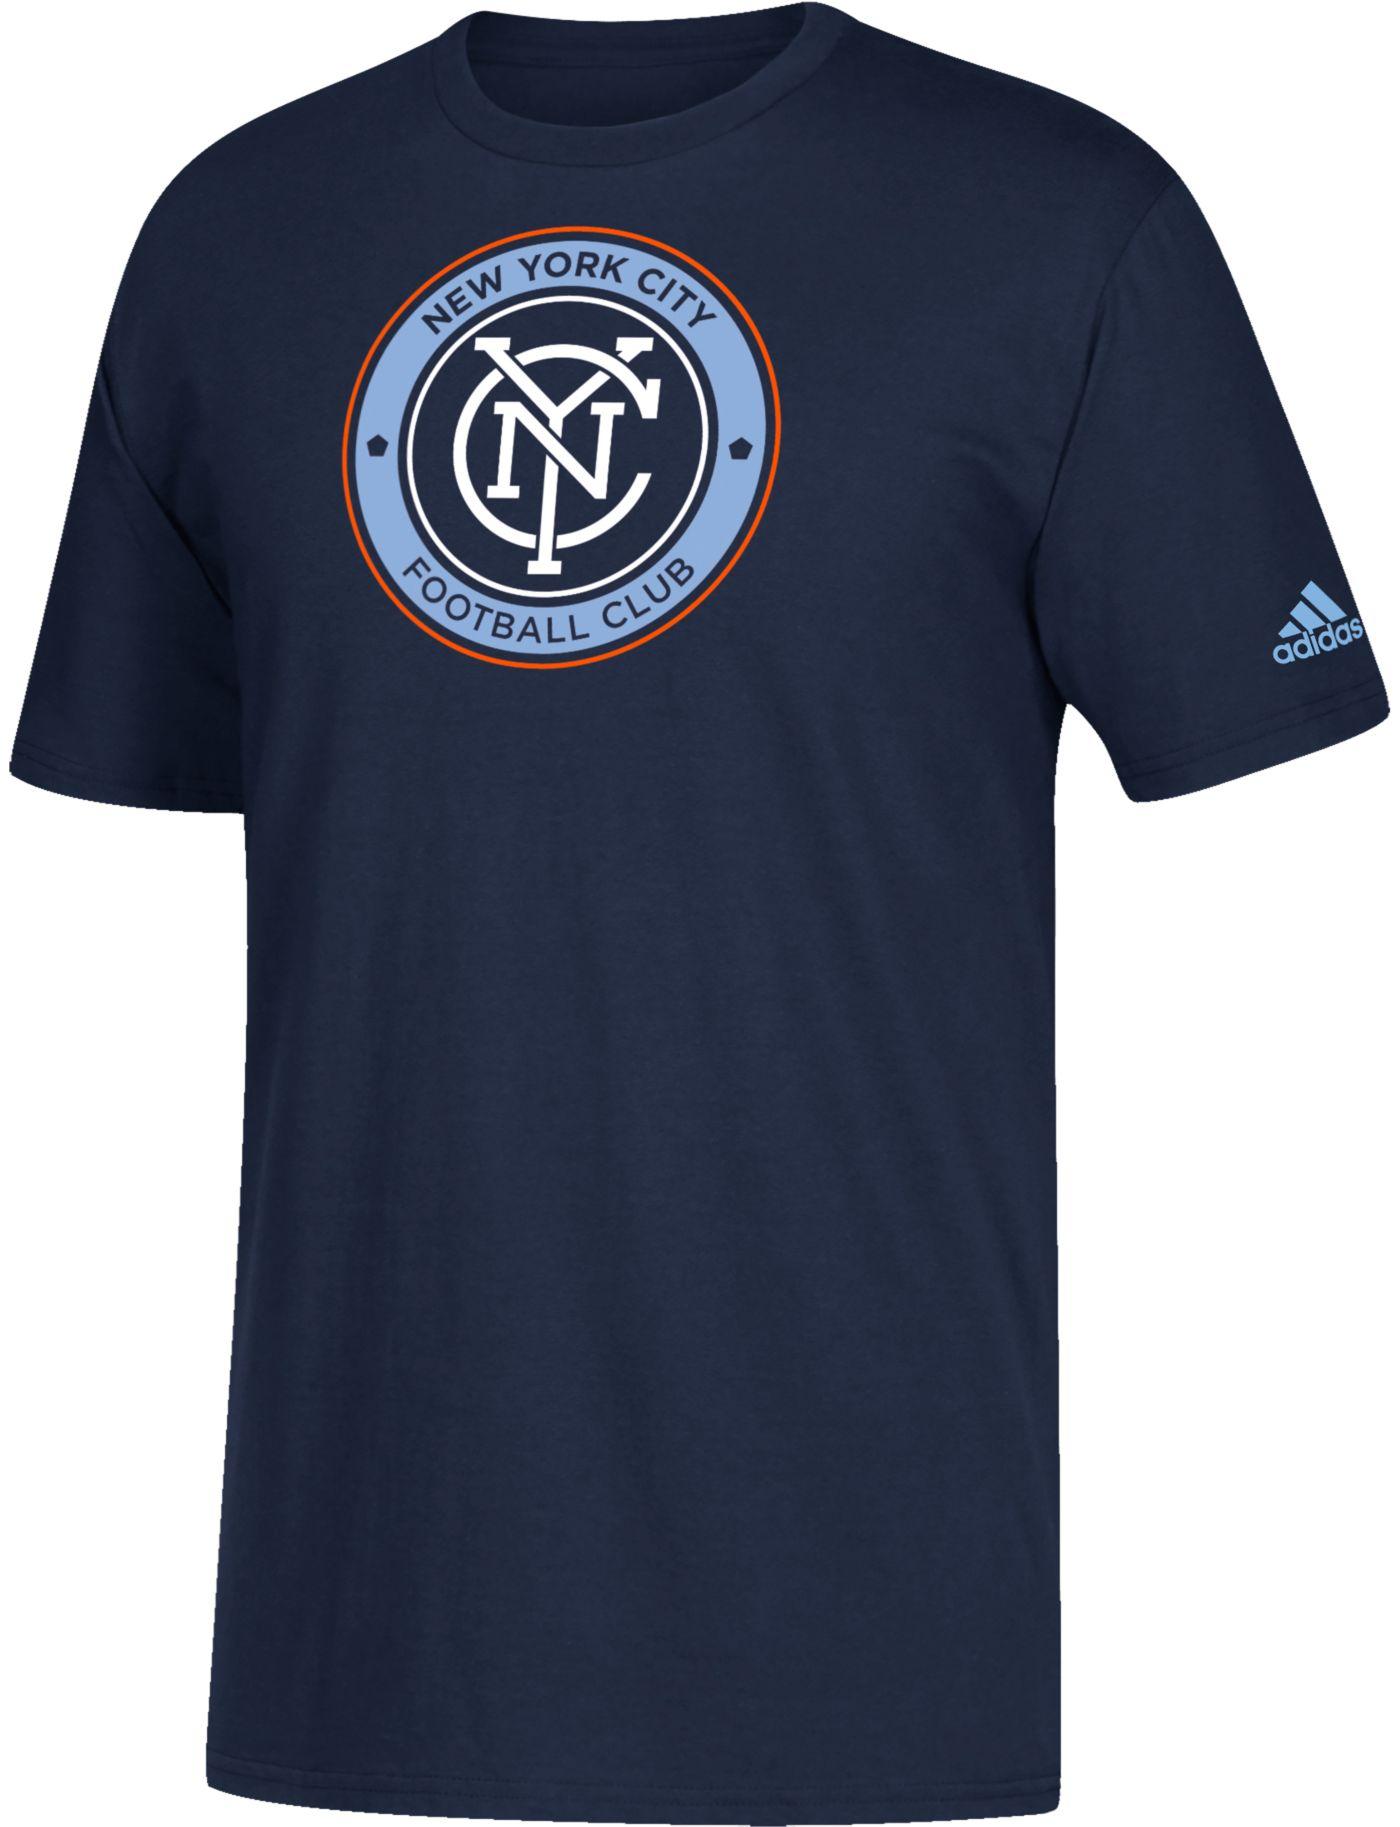 adidas Youth New York City FC Squad Navy T-Shirt